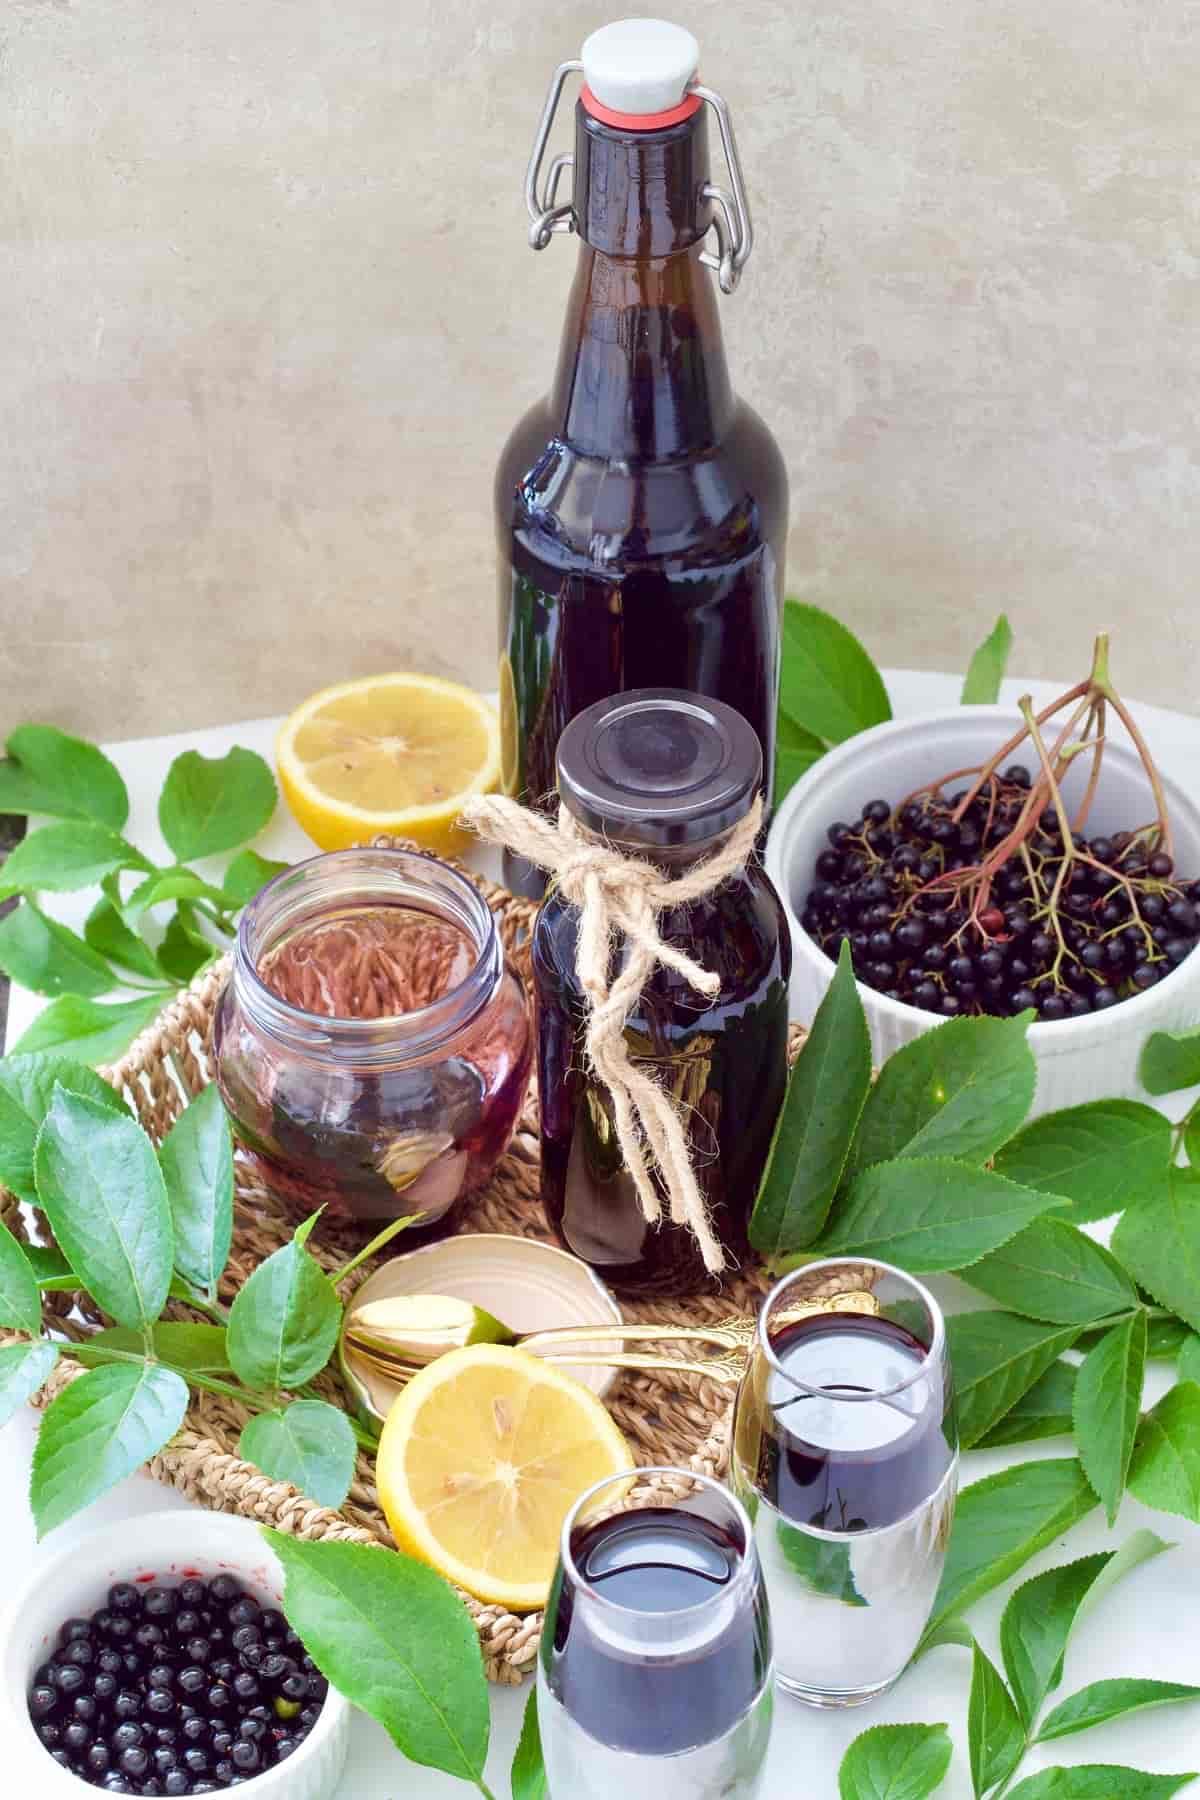 Fresh elderberries, leaves & syrup in bottles, jar & shot glasses.